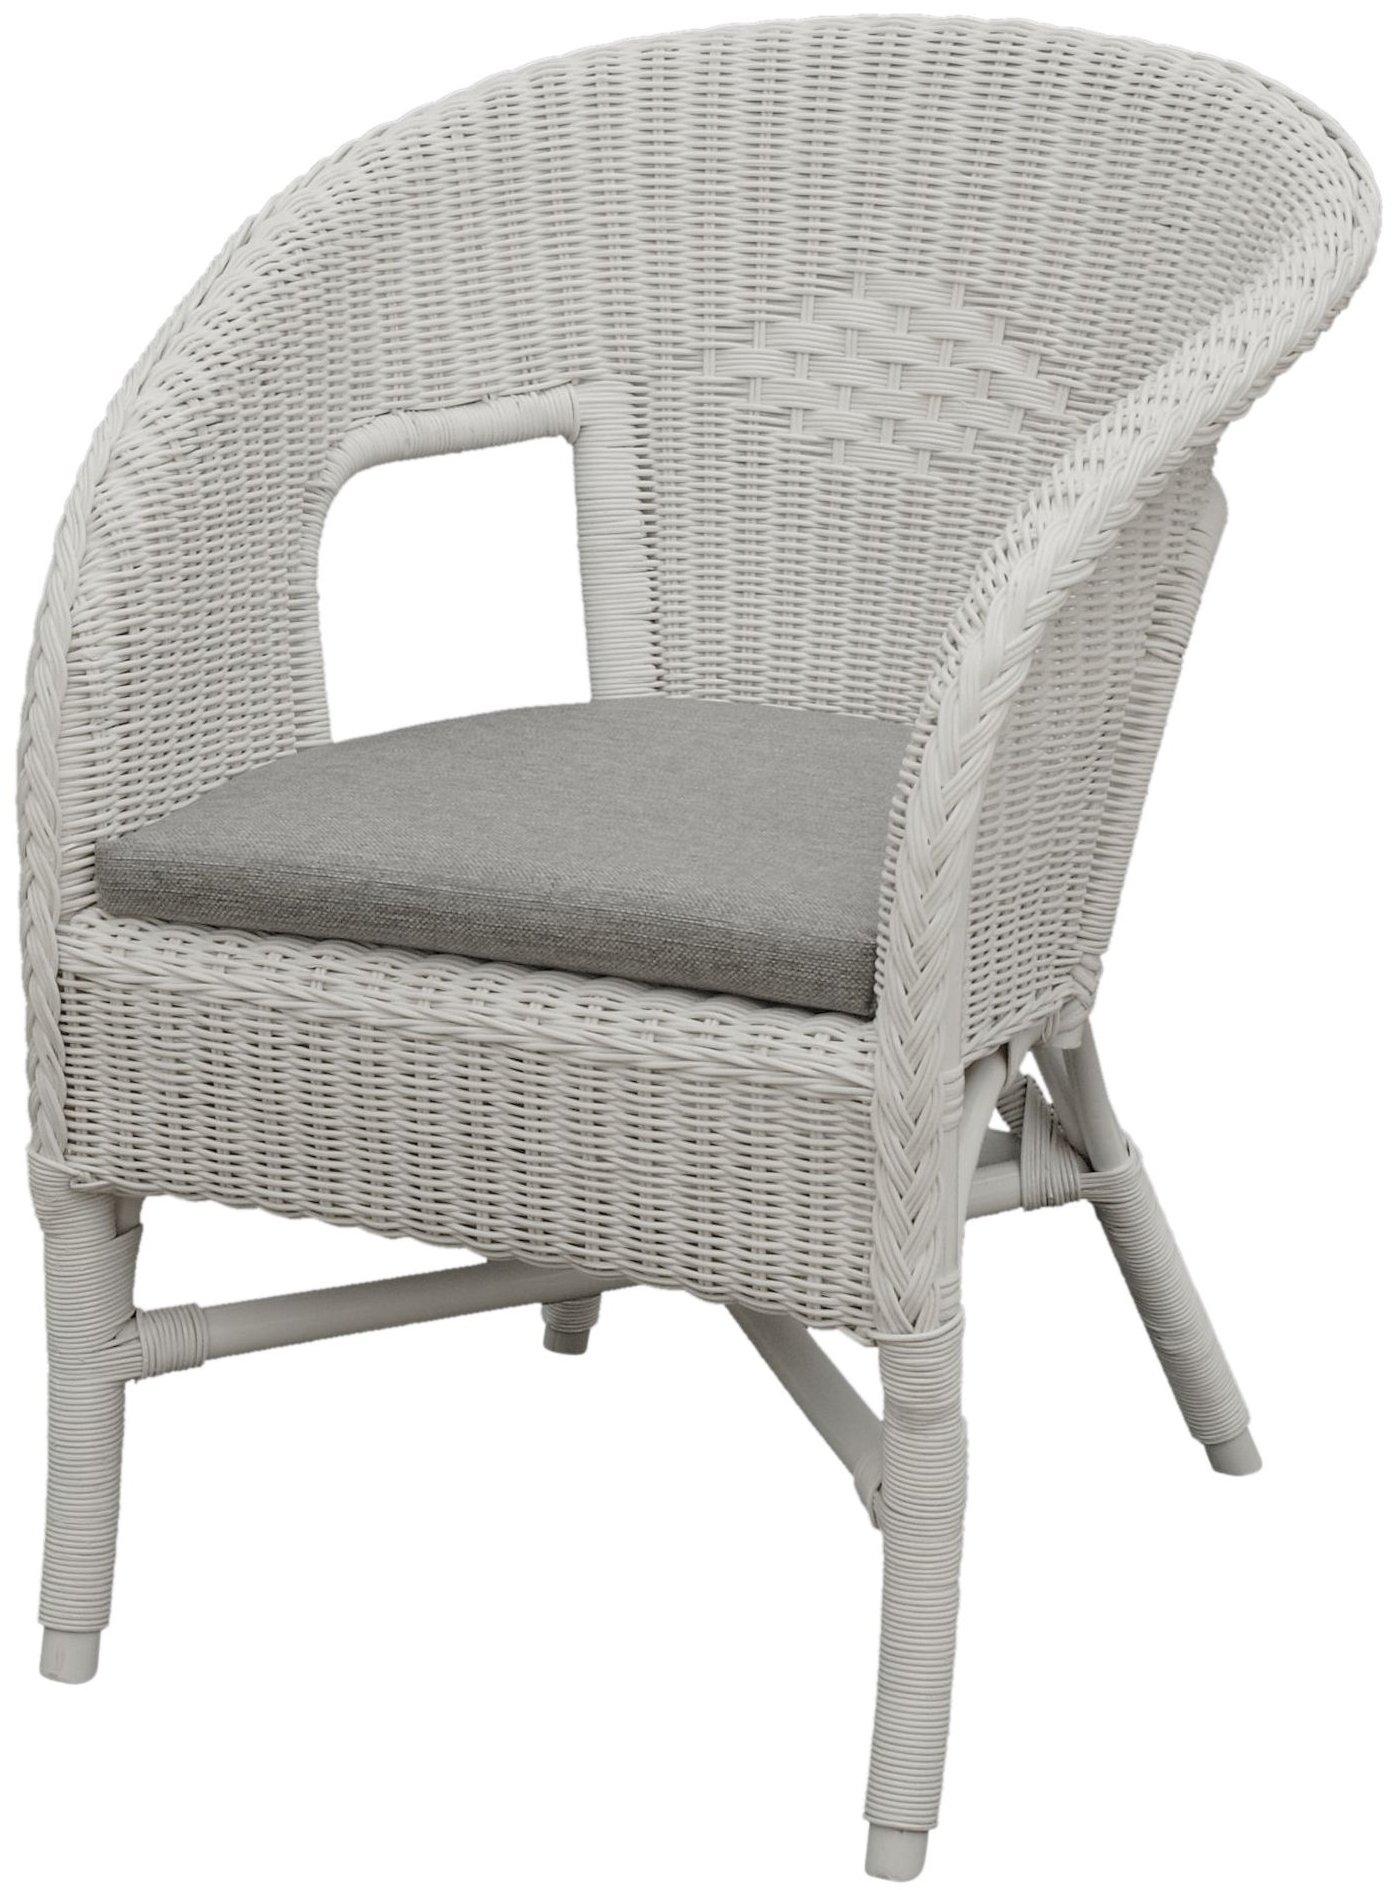 white wicker chair amazon co uk